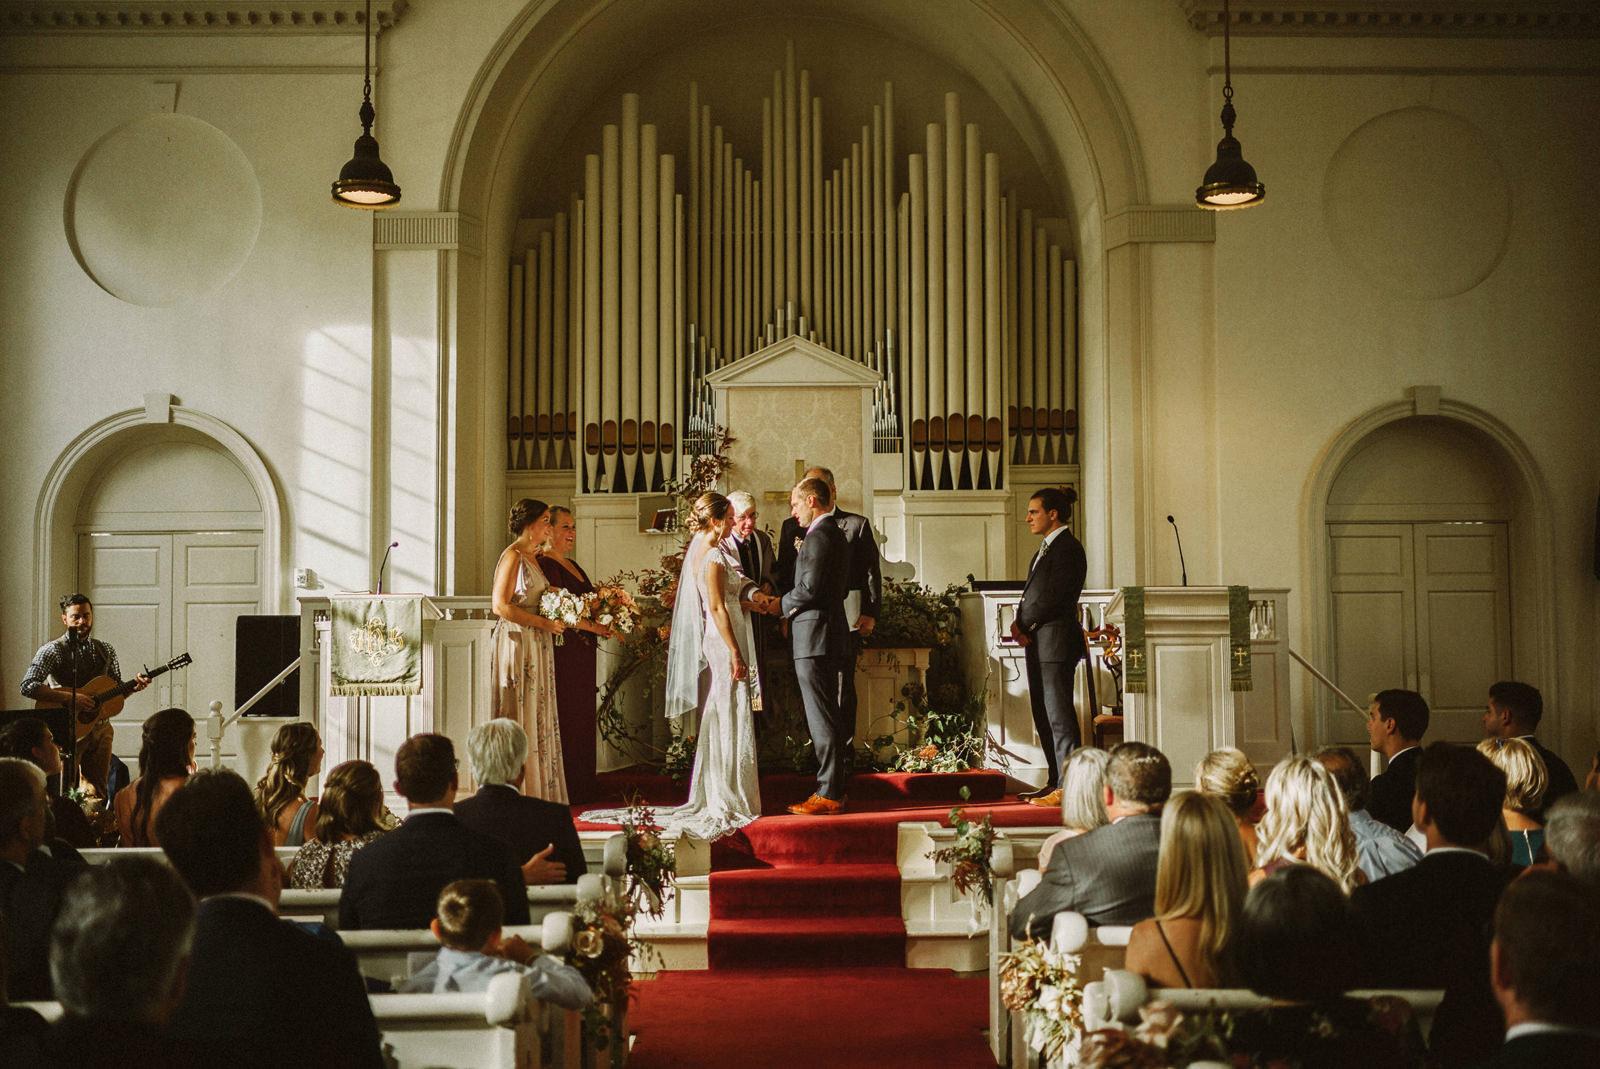 bridgeport-wedding-073 BRIDGEPORT, CONNECTICUT BACKYARD WEDDING